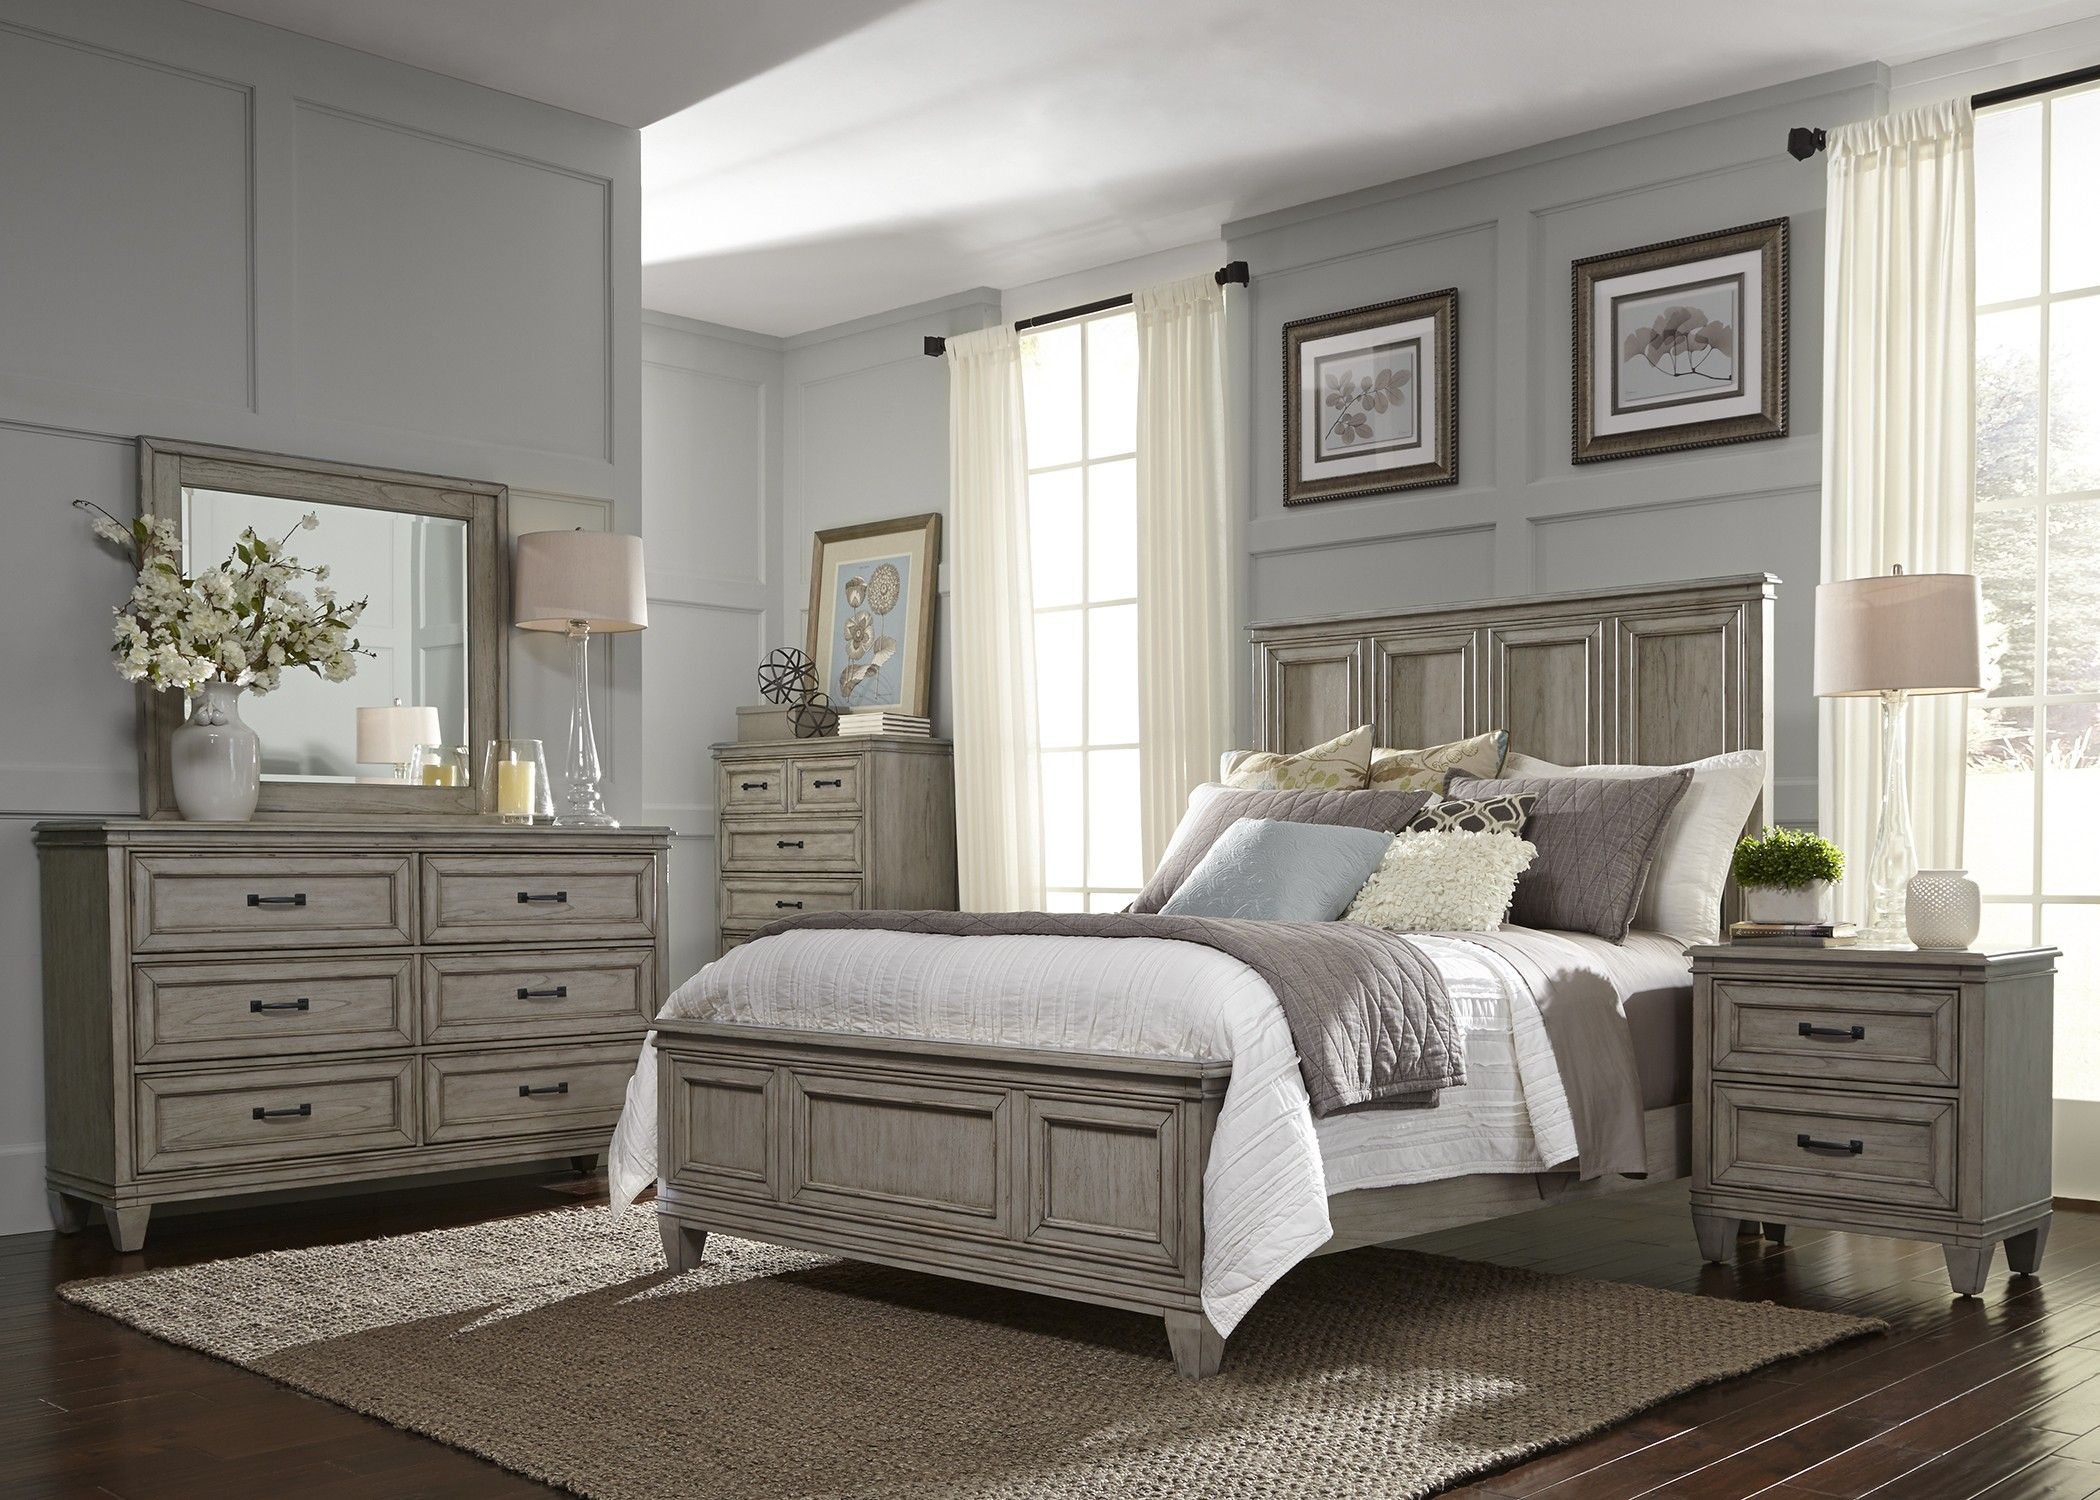 Awesome Grayton Grove Driftwood Panel Bedroom Set